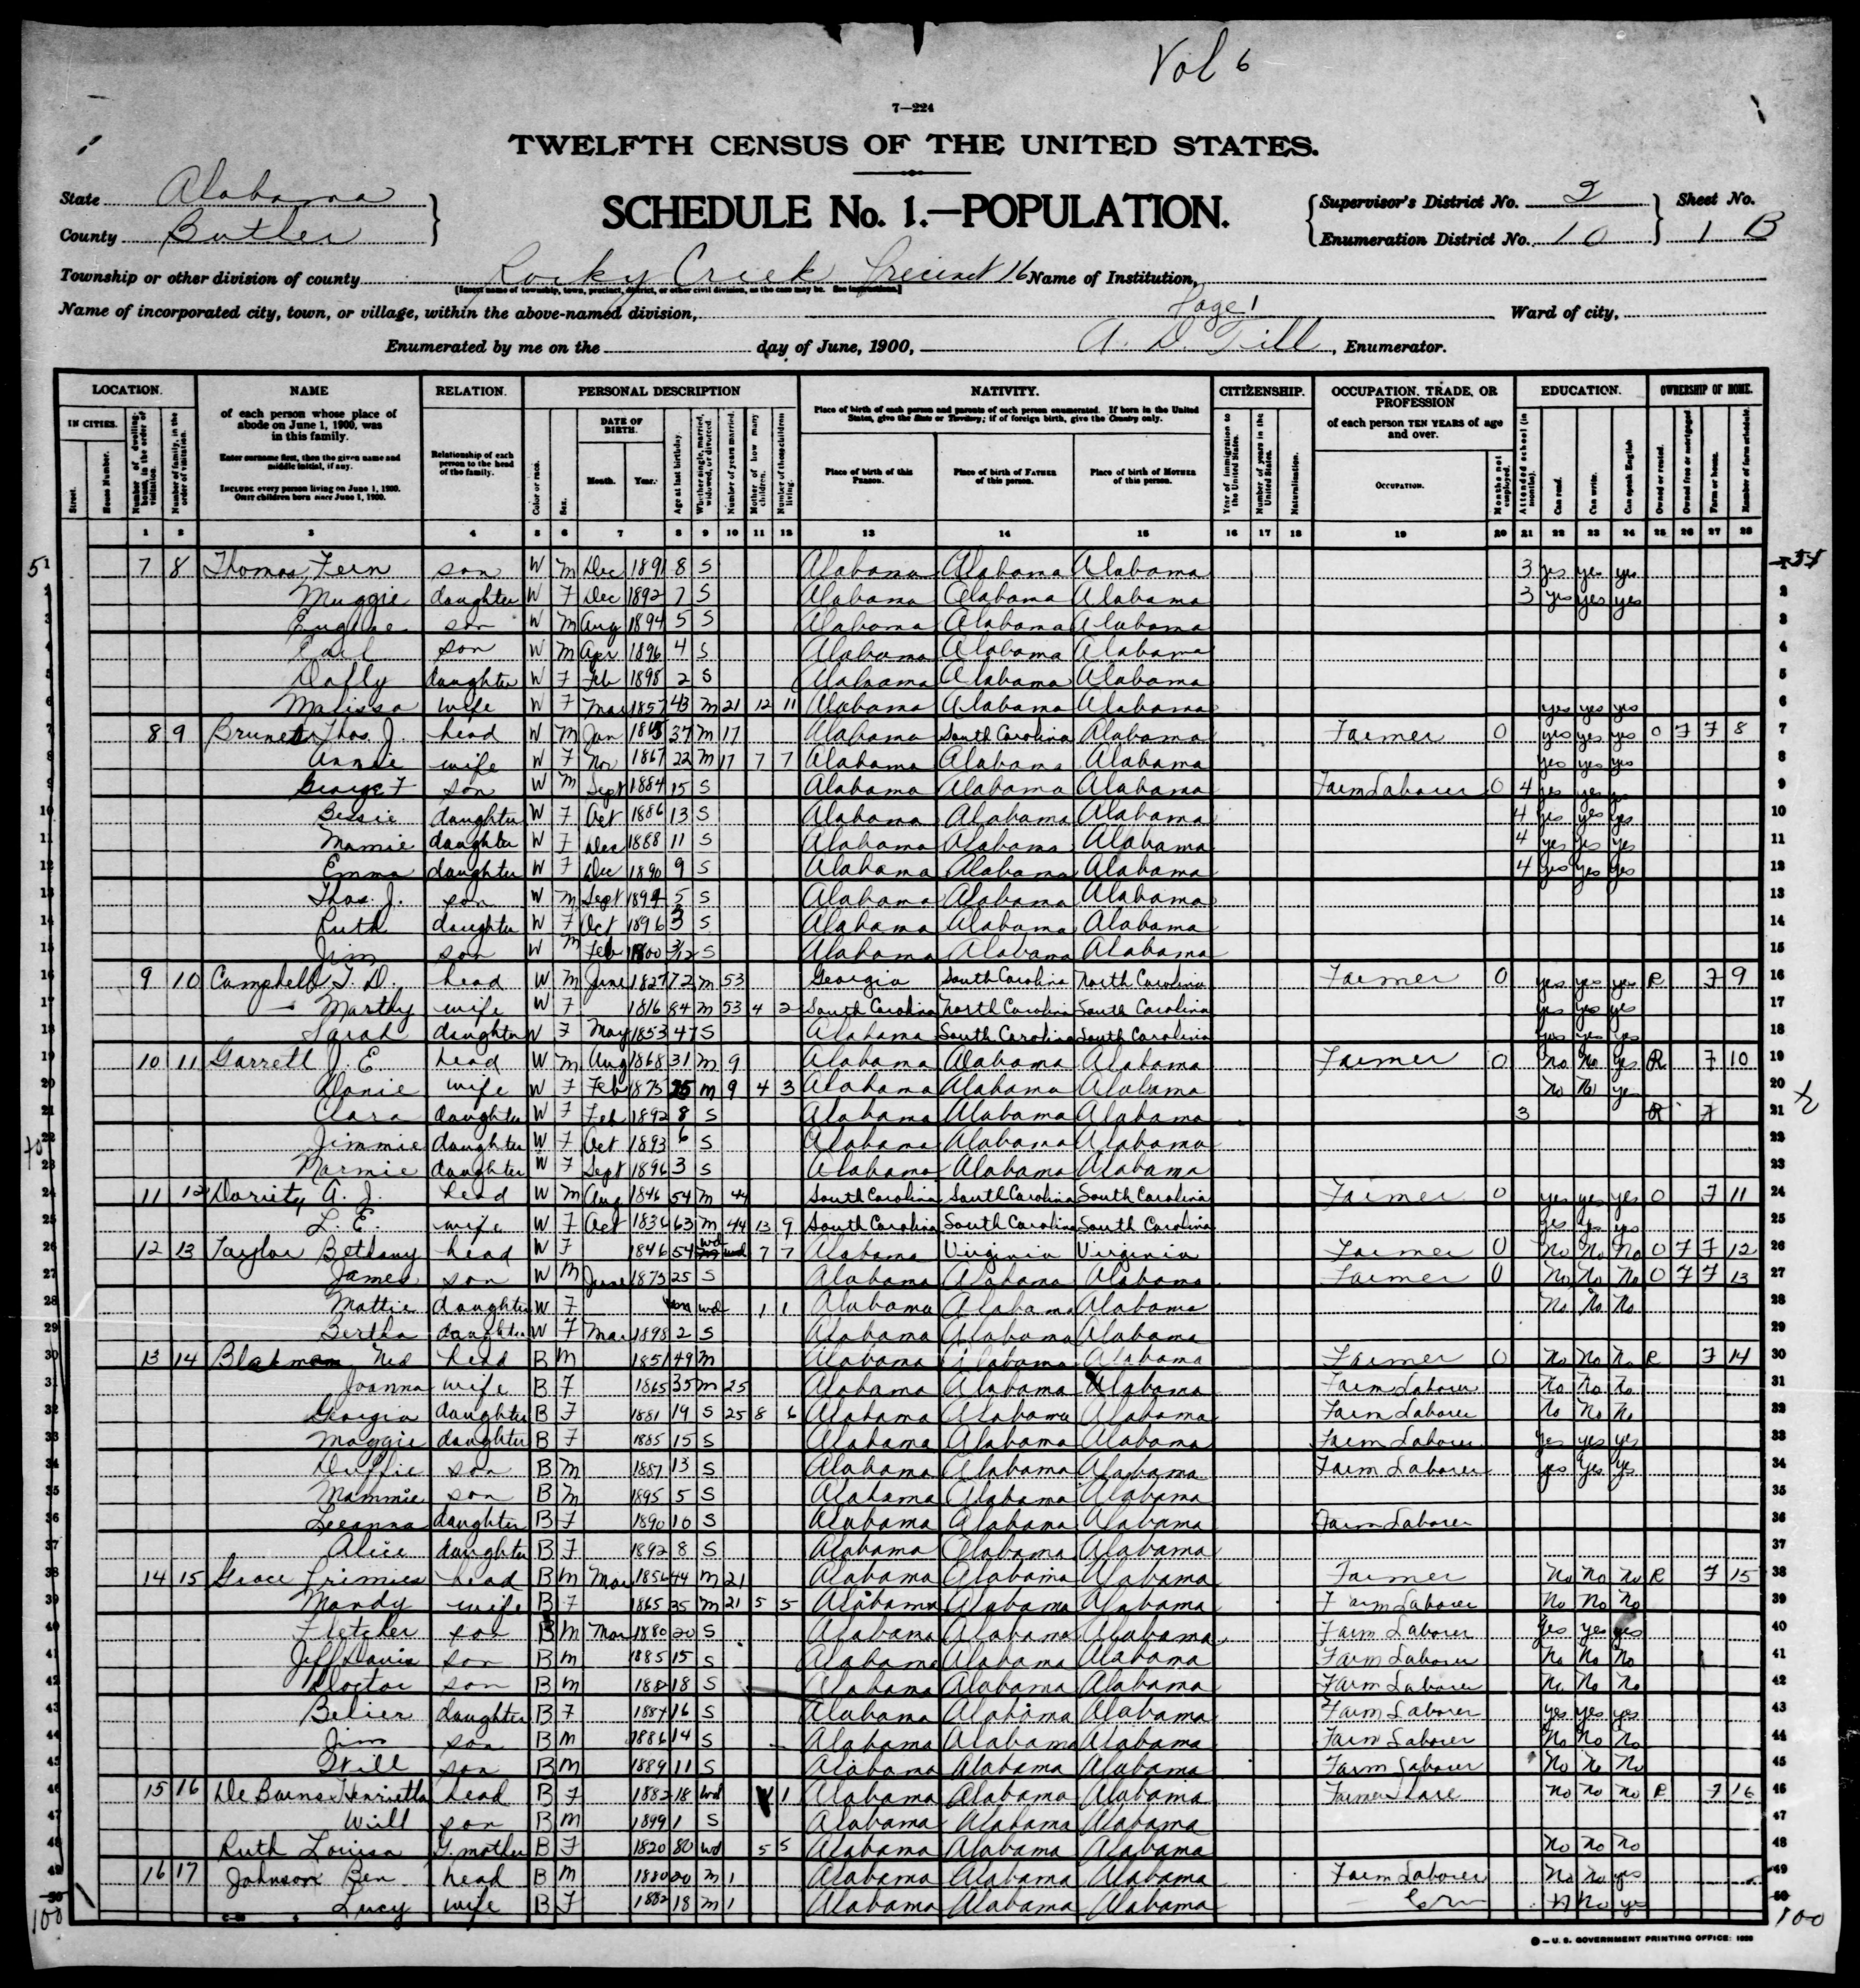 Alabama: BUTLER County, Enumeration District 10, Sheet No. 1B